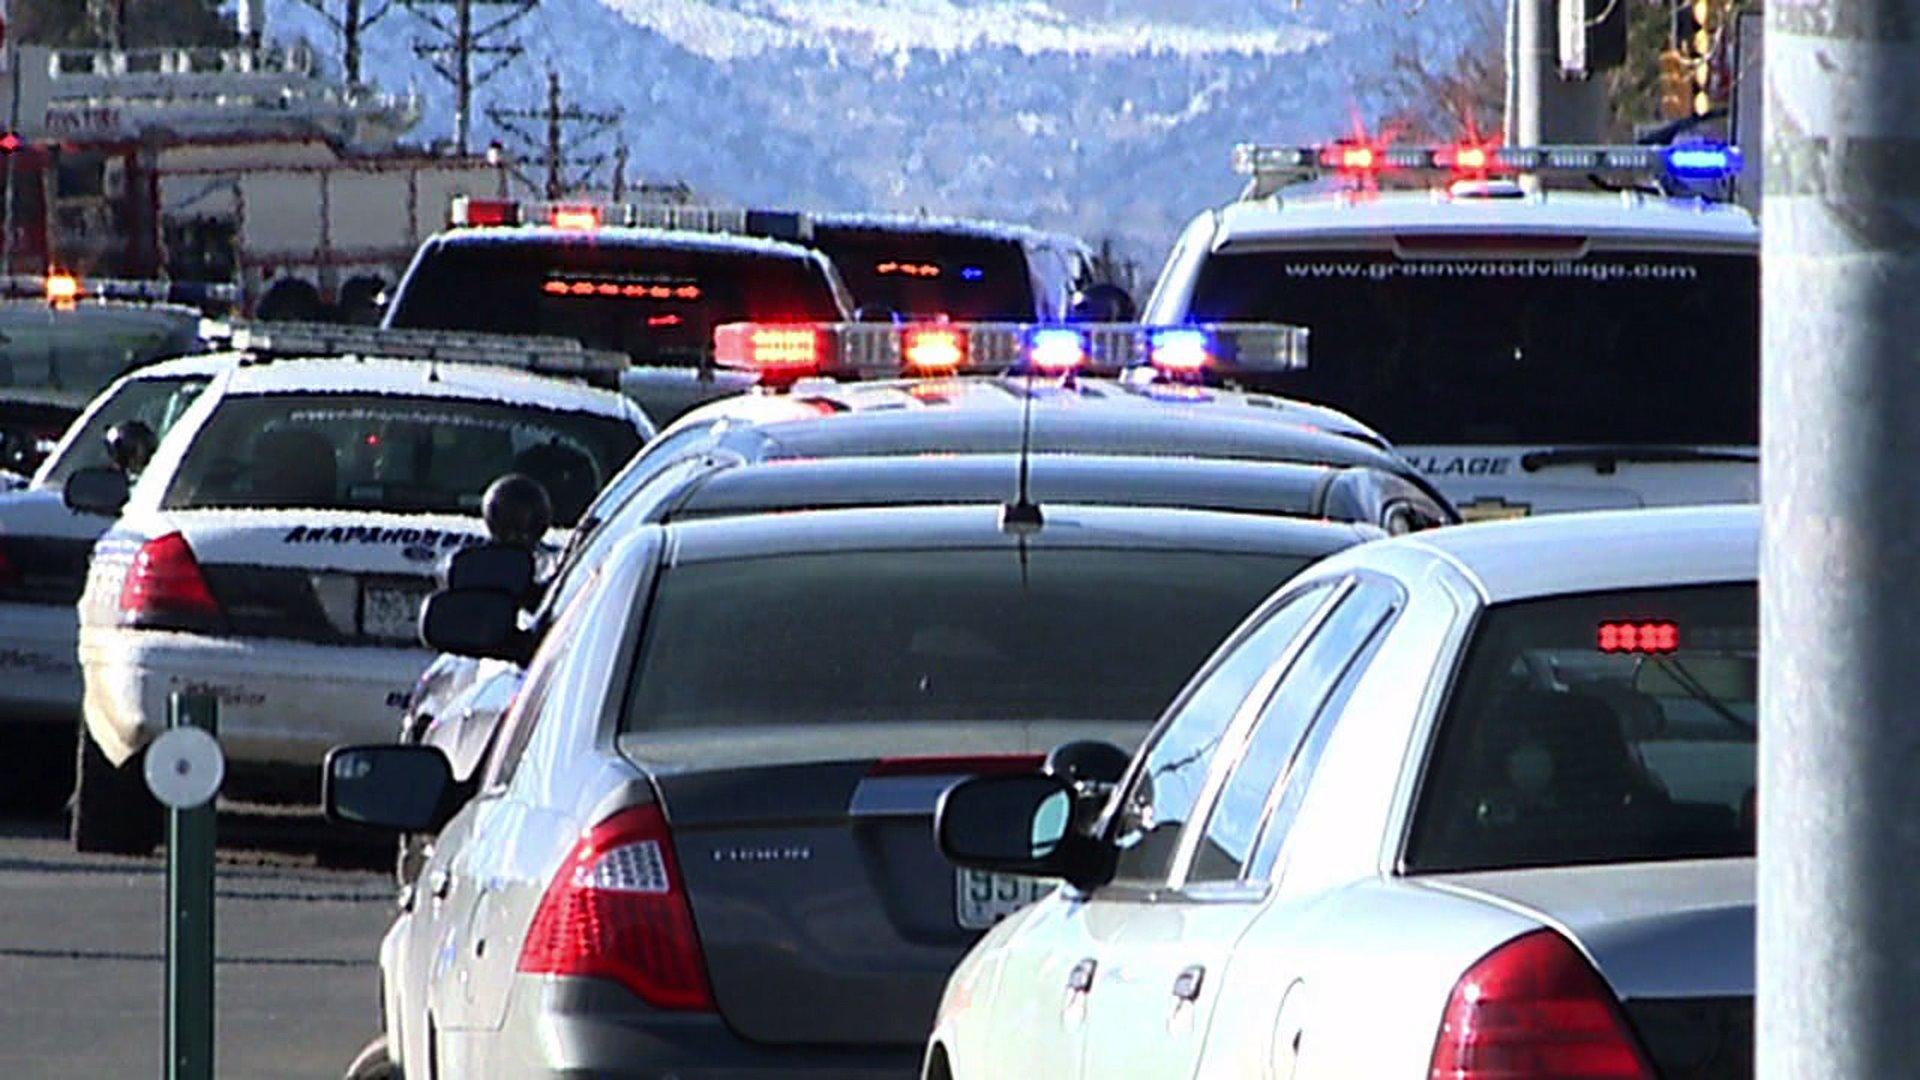 Emergency response following Arapahoe High School shooting